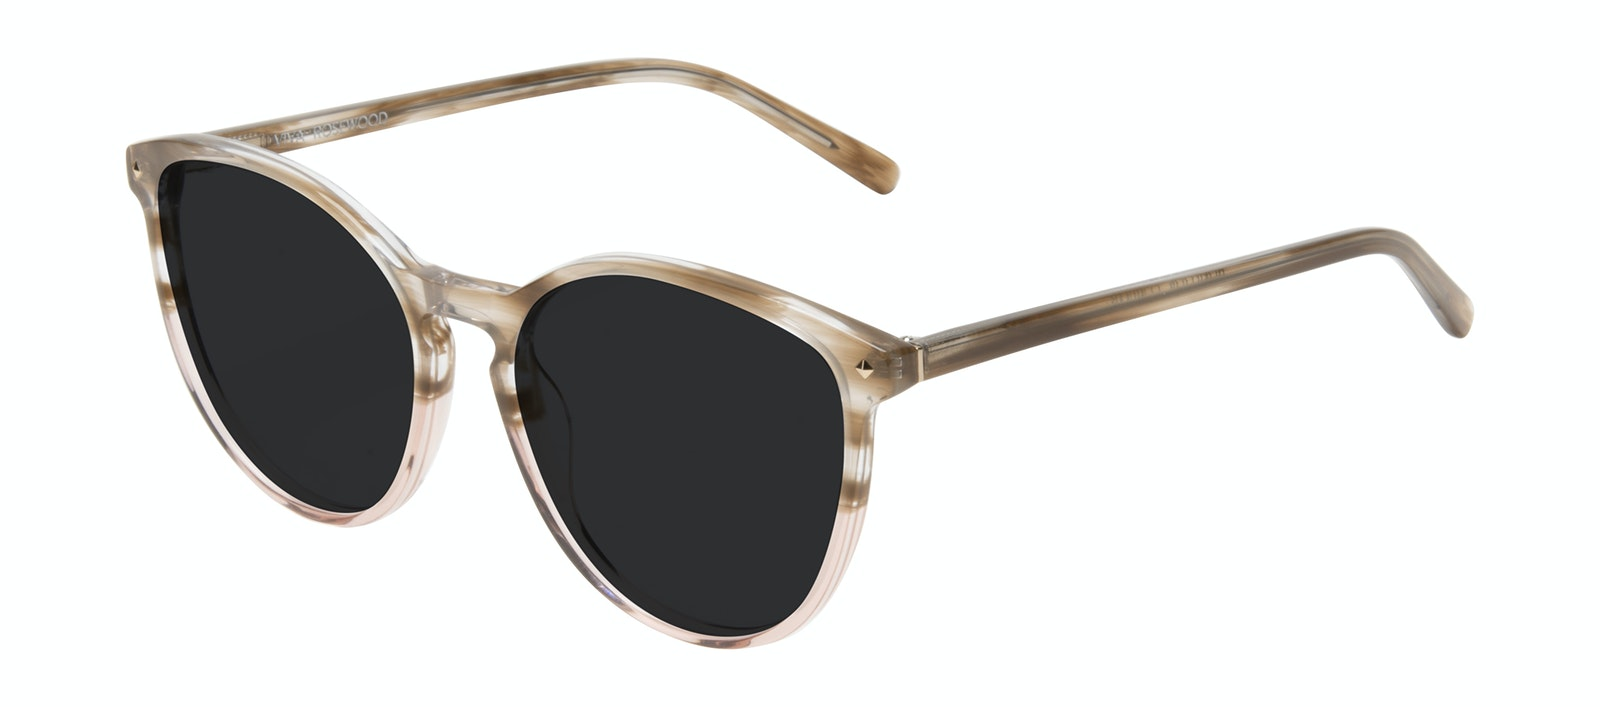 Affordable Fashion Glasses Round Sunglasses Women Viva Rosewood Tilt